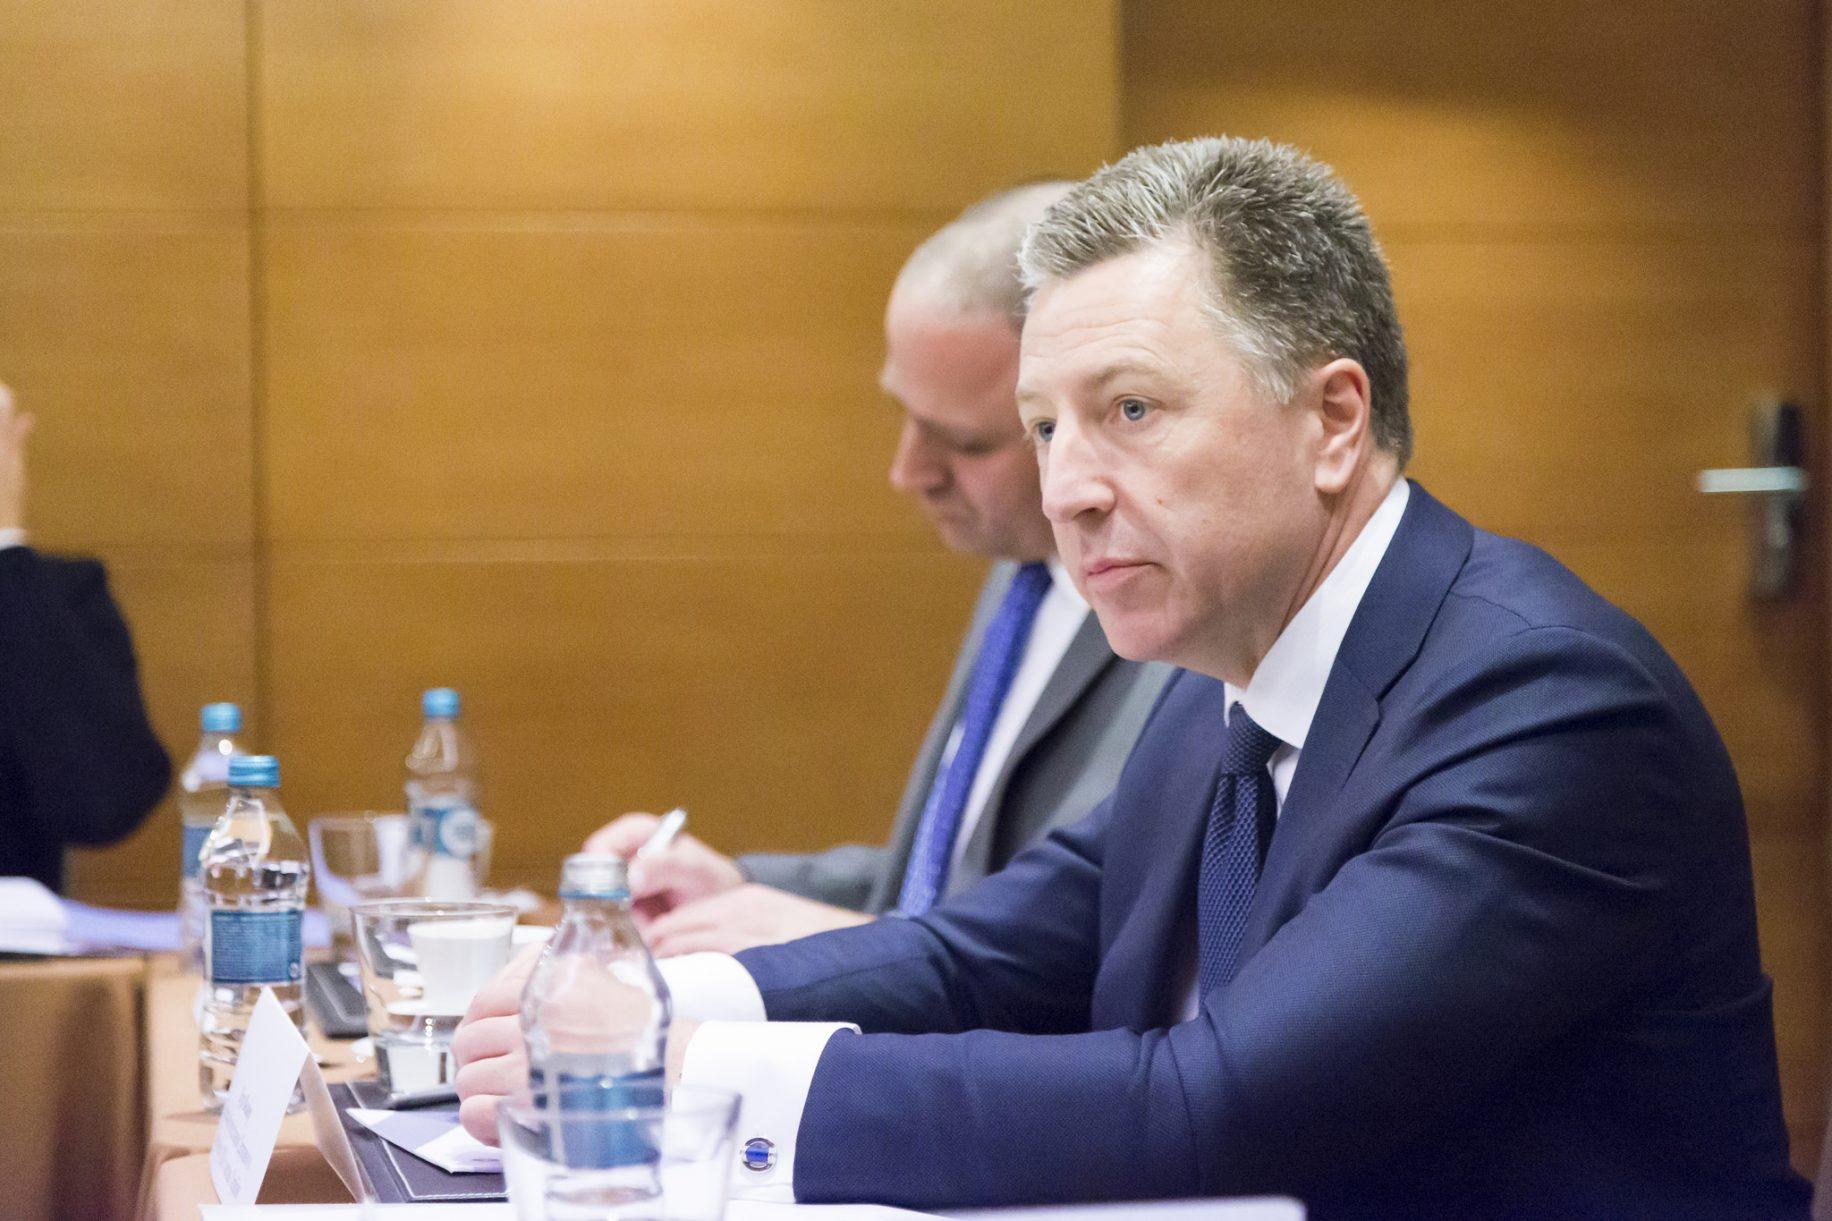 US special envoy to Ukraine says Russian propaganda hindering peace efforts